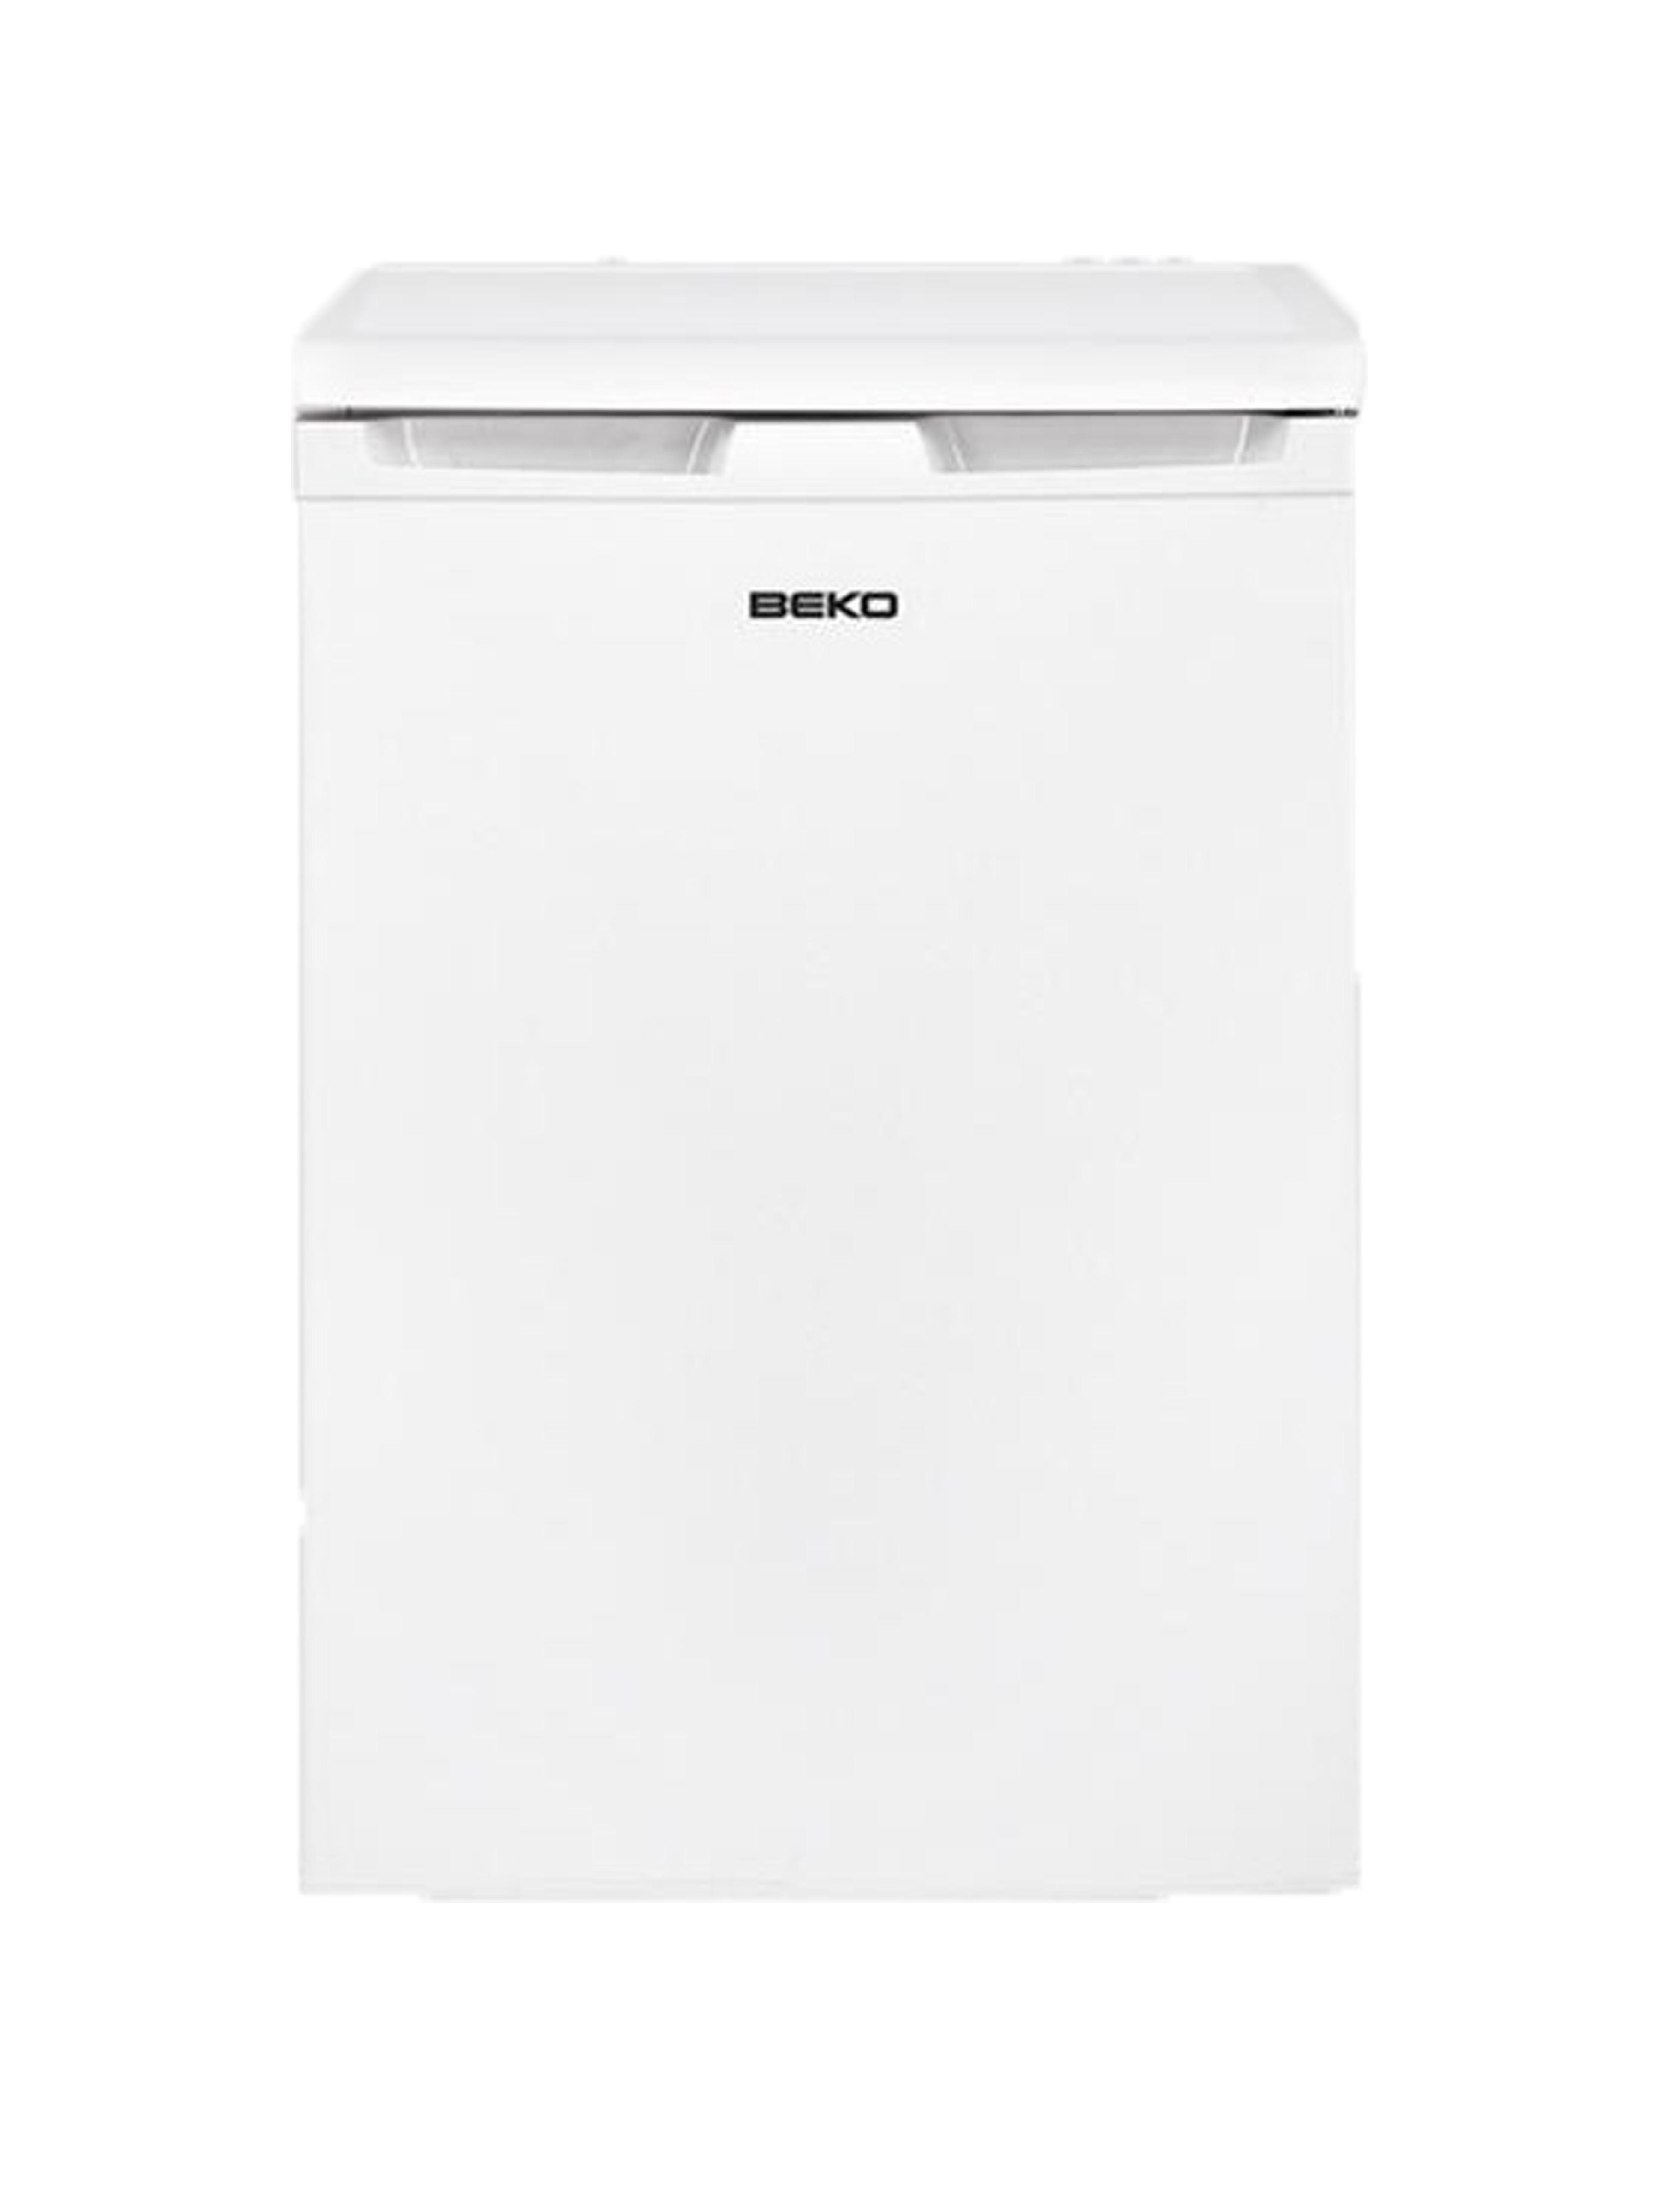 Beko TSE1422 koelkast zonder vriesvak